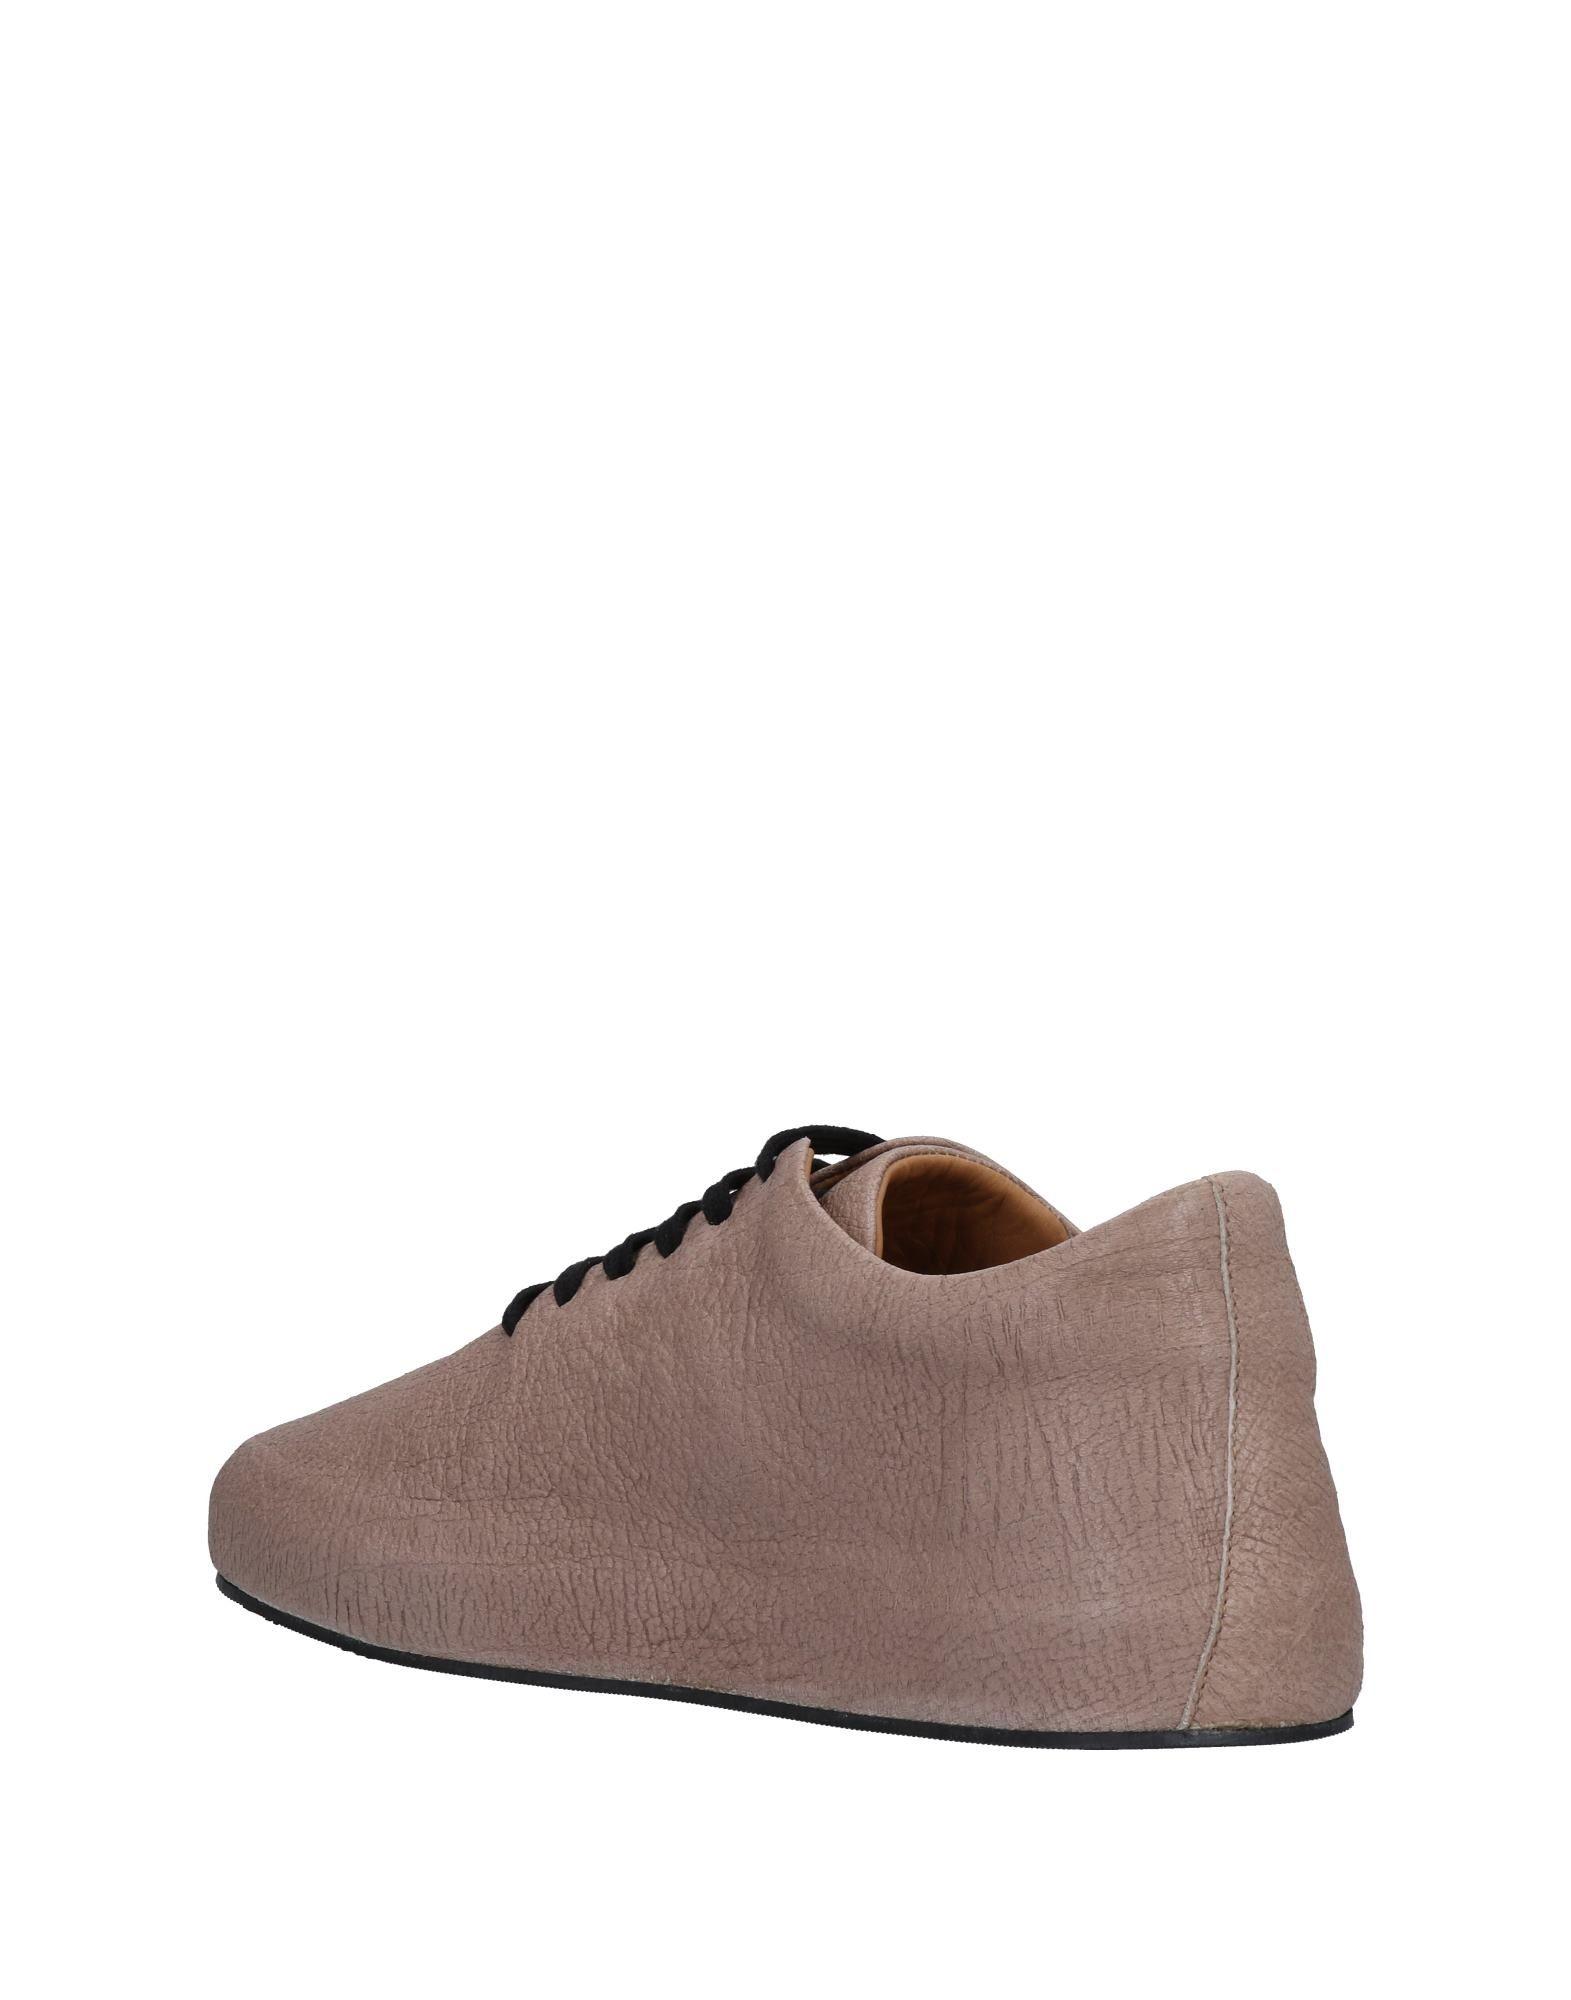 Unonovecinque Sneakers Herren Qualität  11489803IH Gute Qualität Herren beliebte Schuhe b09a5e